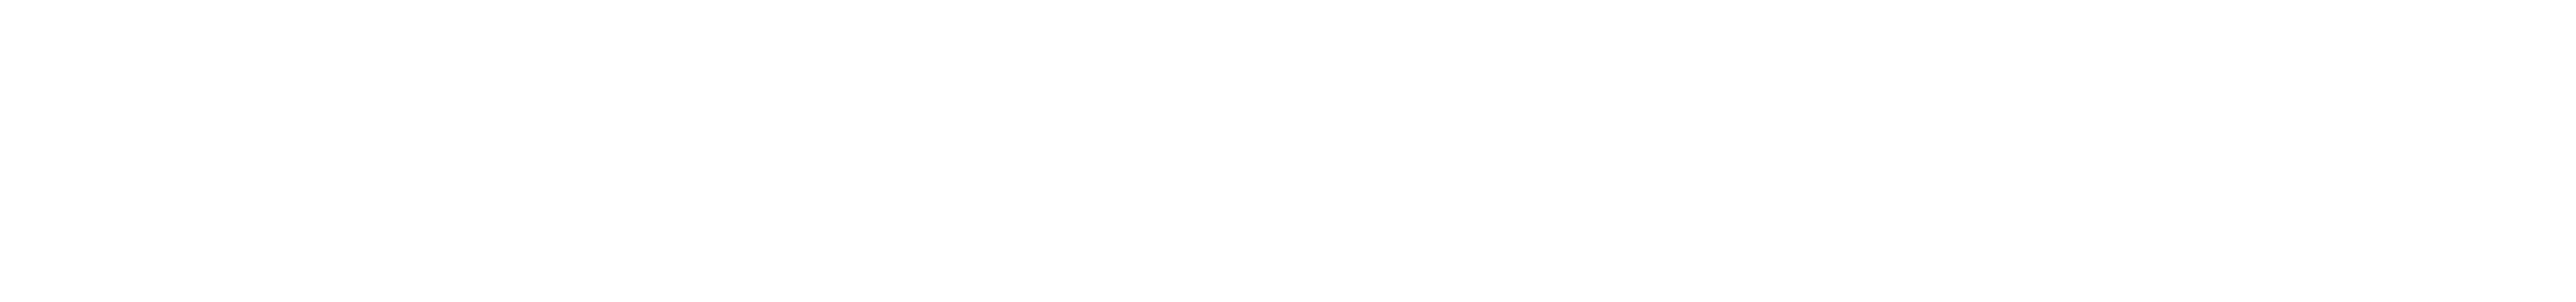 DEG-Treff